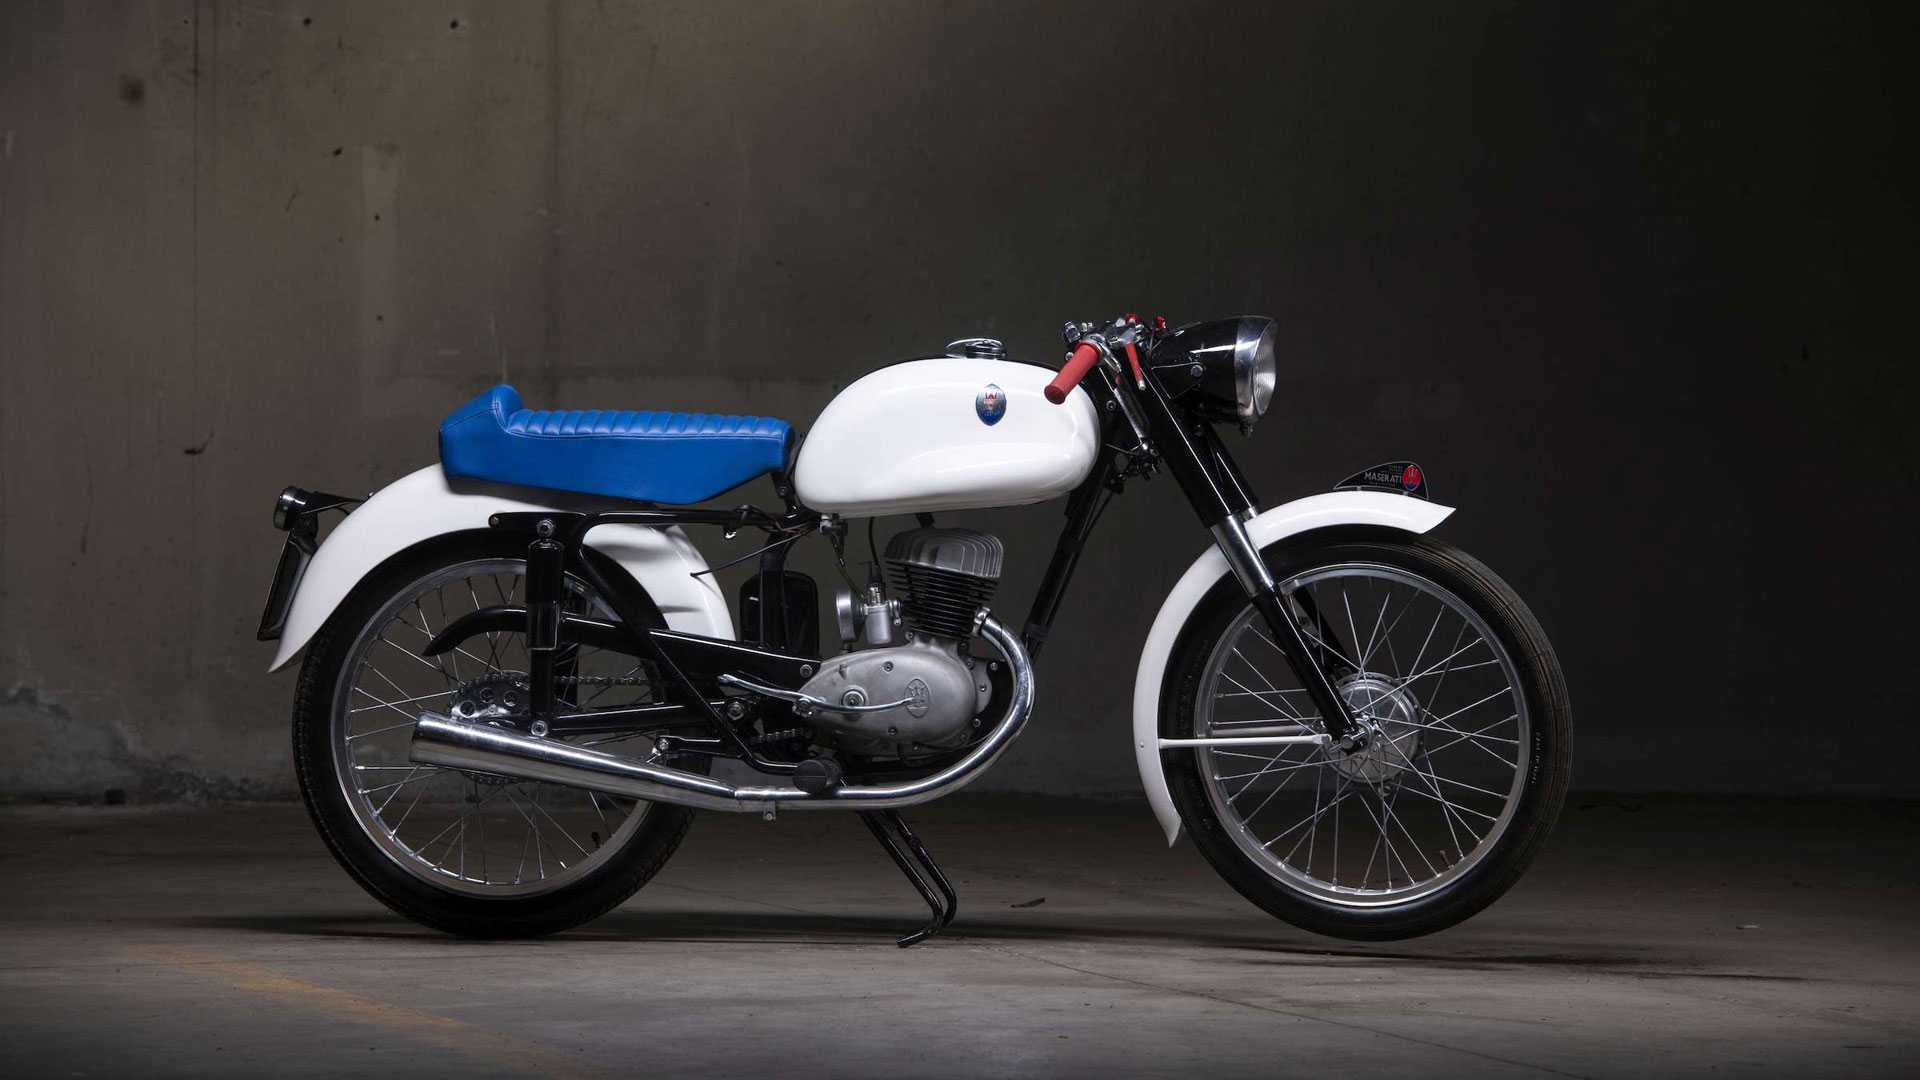 Редчайший мотоцикл Maserati, о котором никто не знал